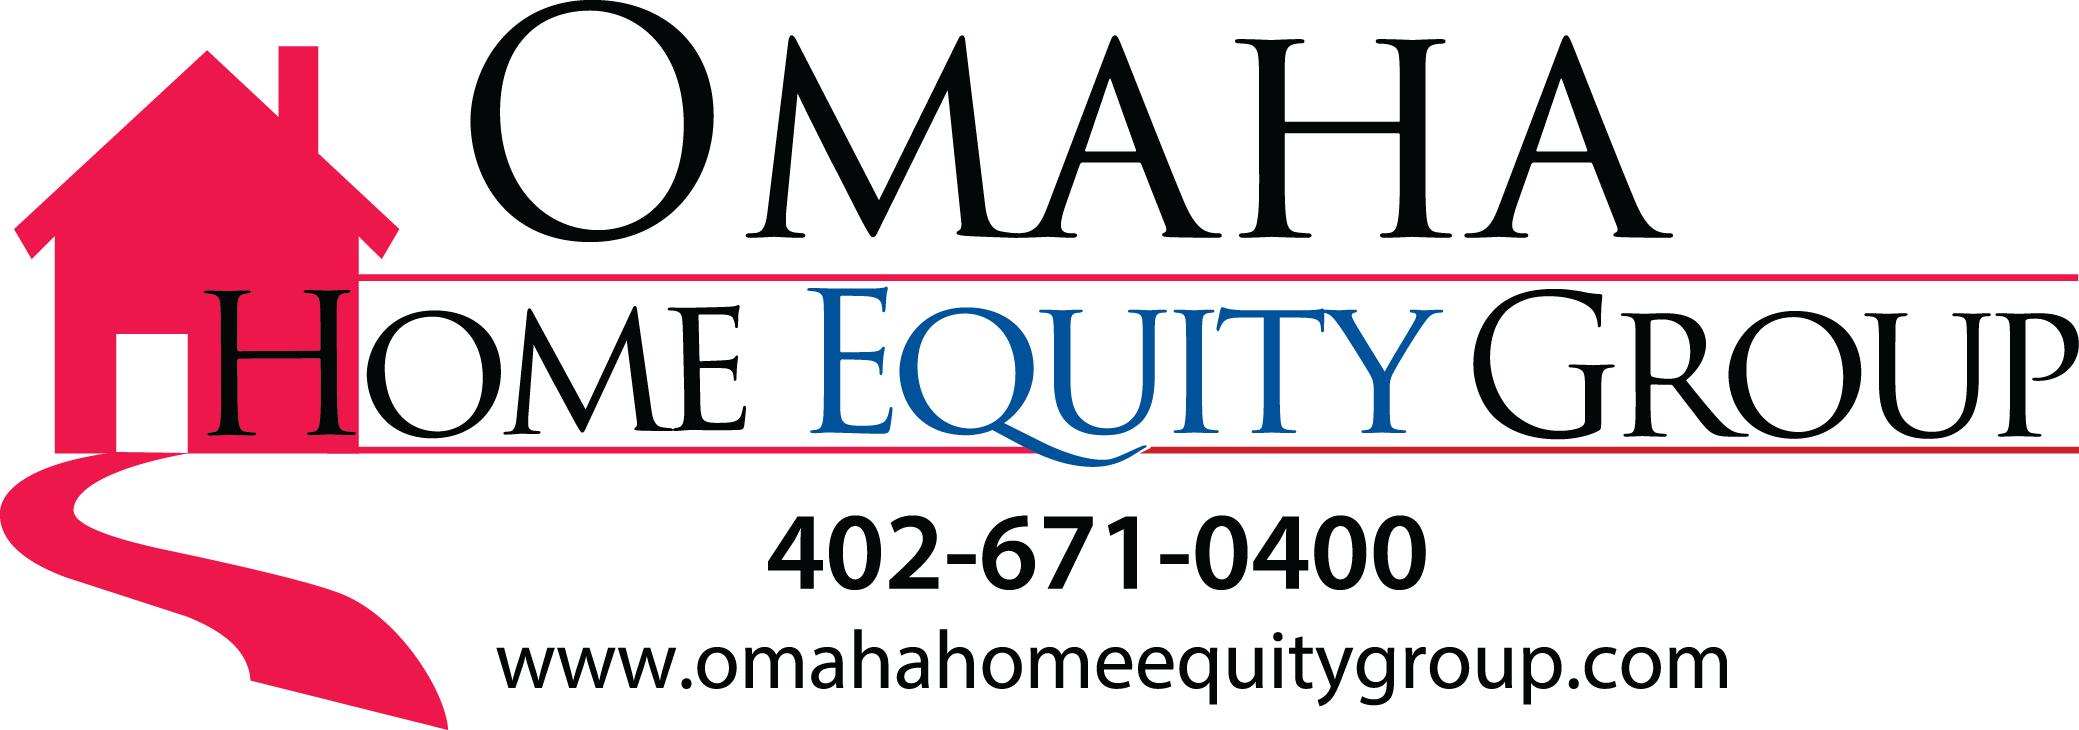 Omaha Home Equity Group